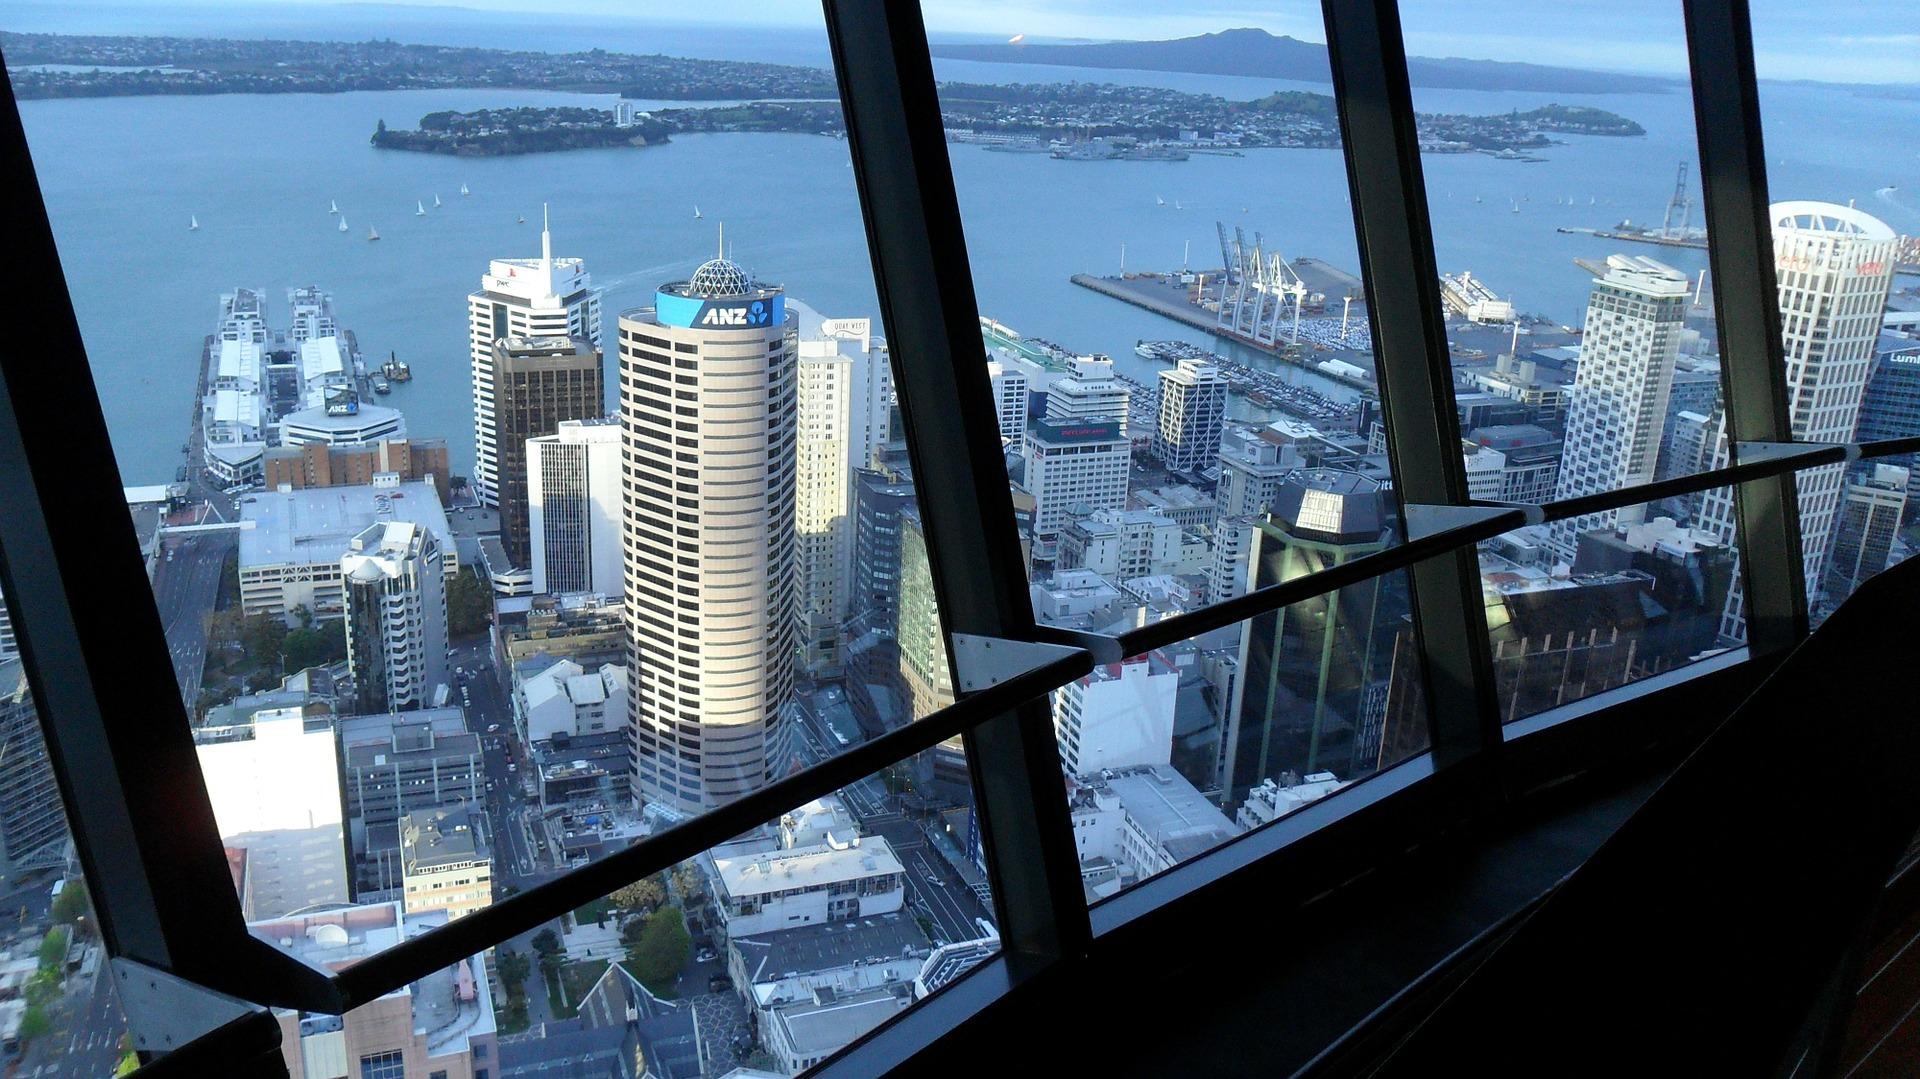 sky-city-tower-view-197768_1920.jpg